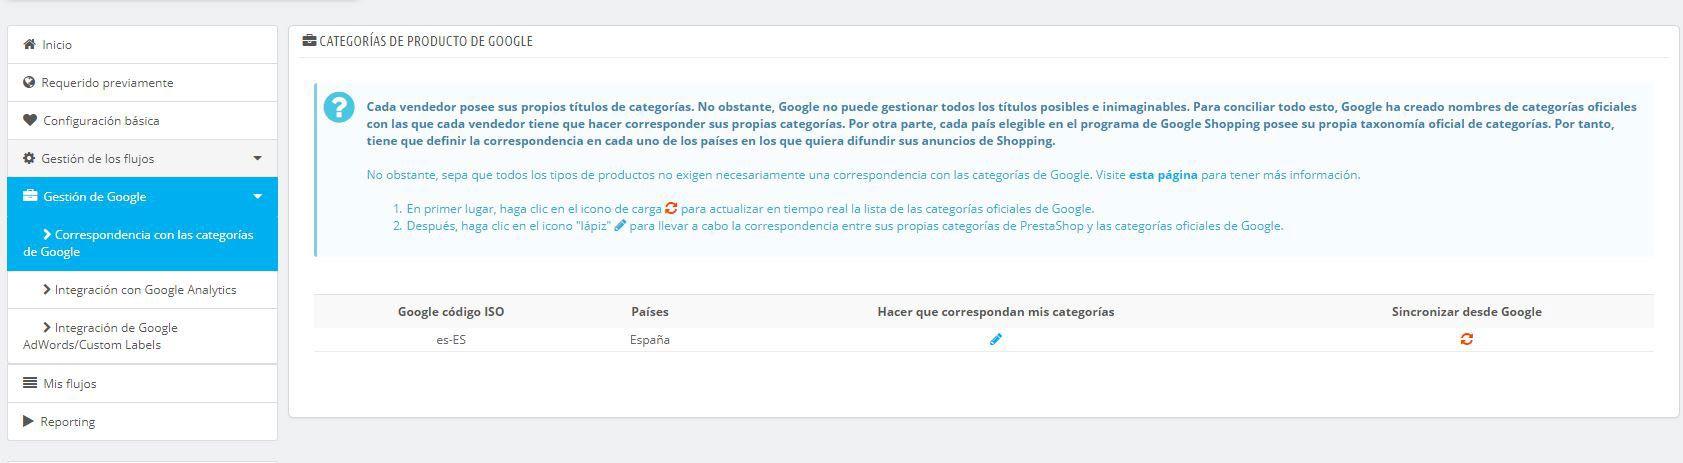 categori-producto-google